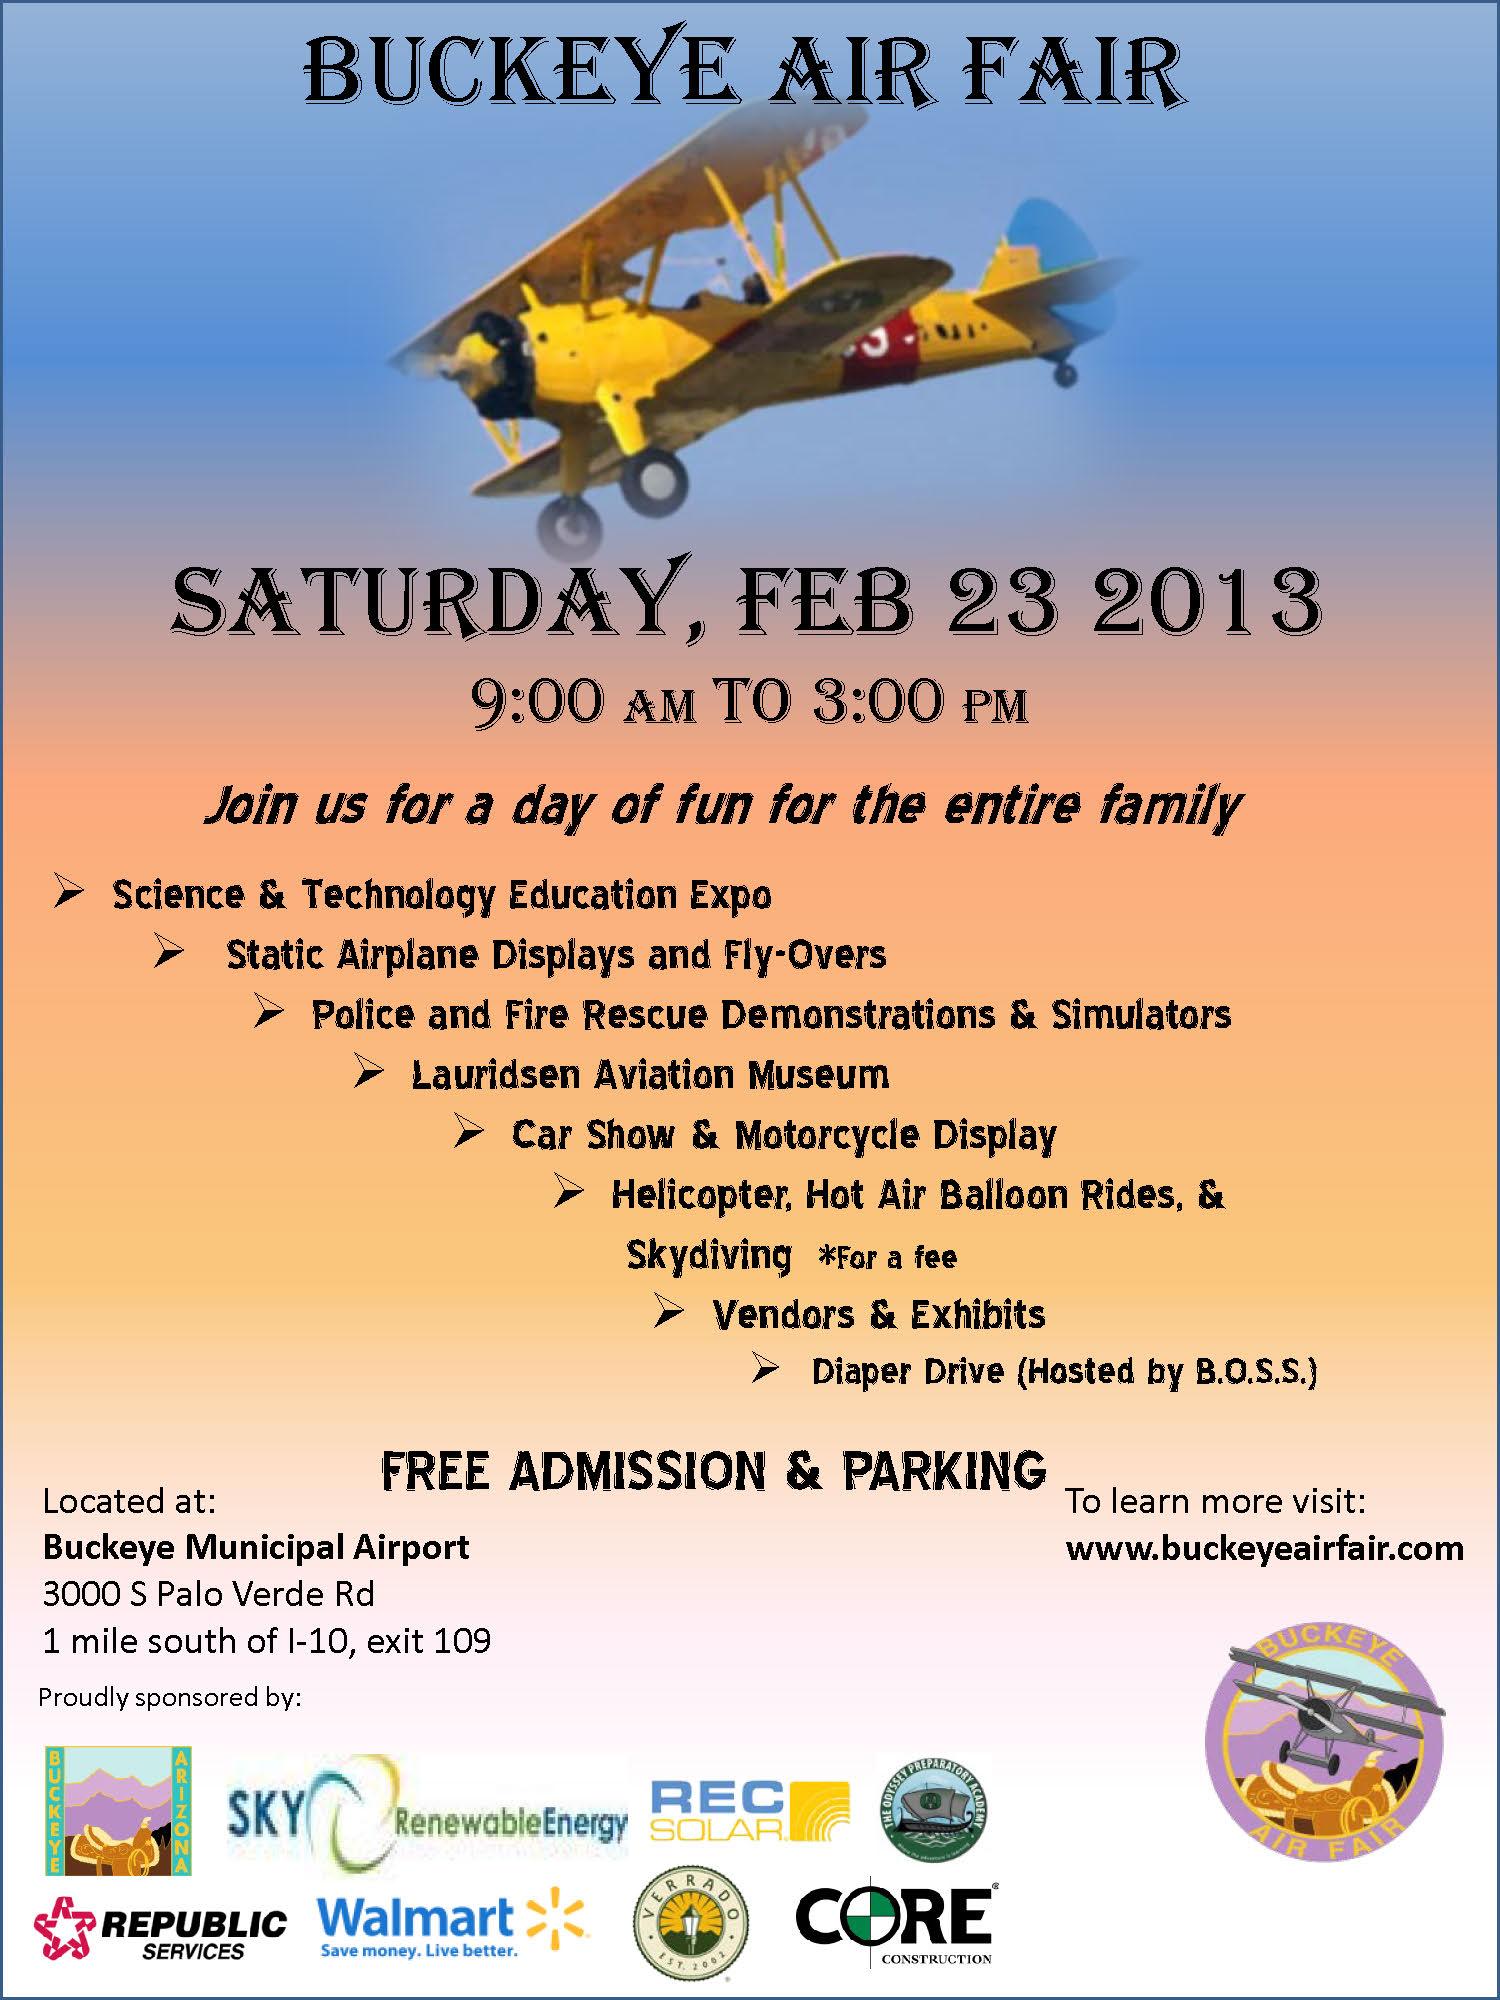 Buckeye Air Fair 2013